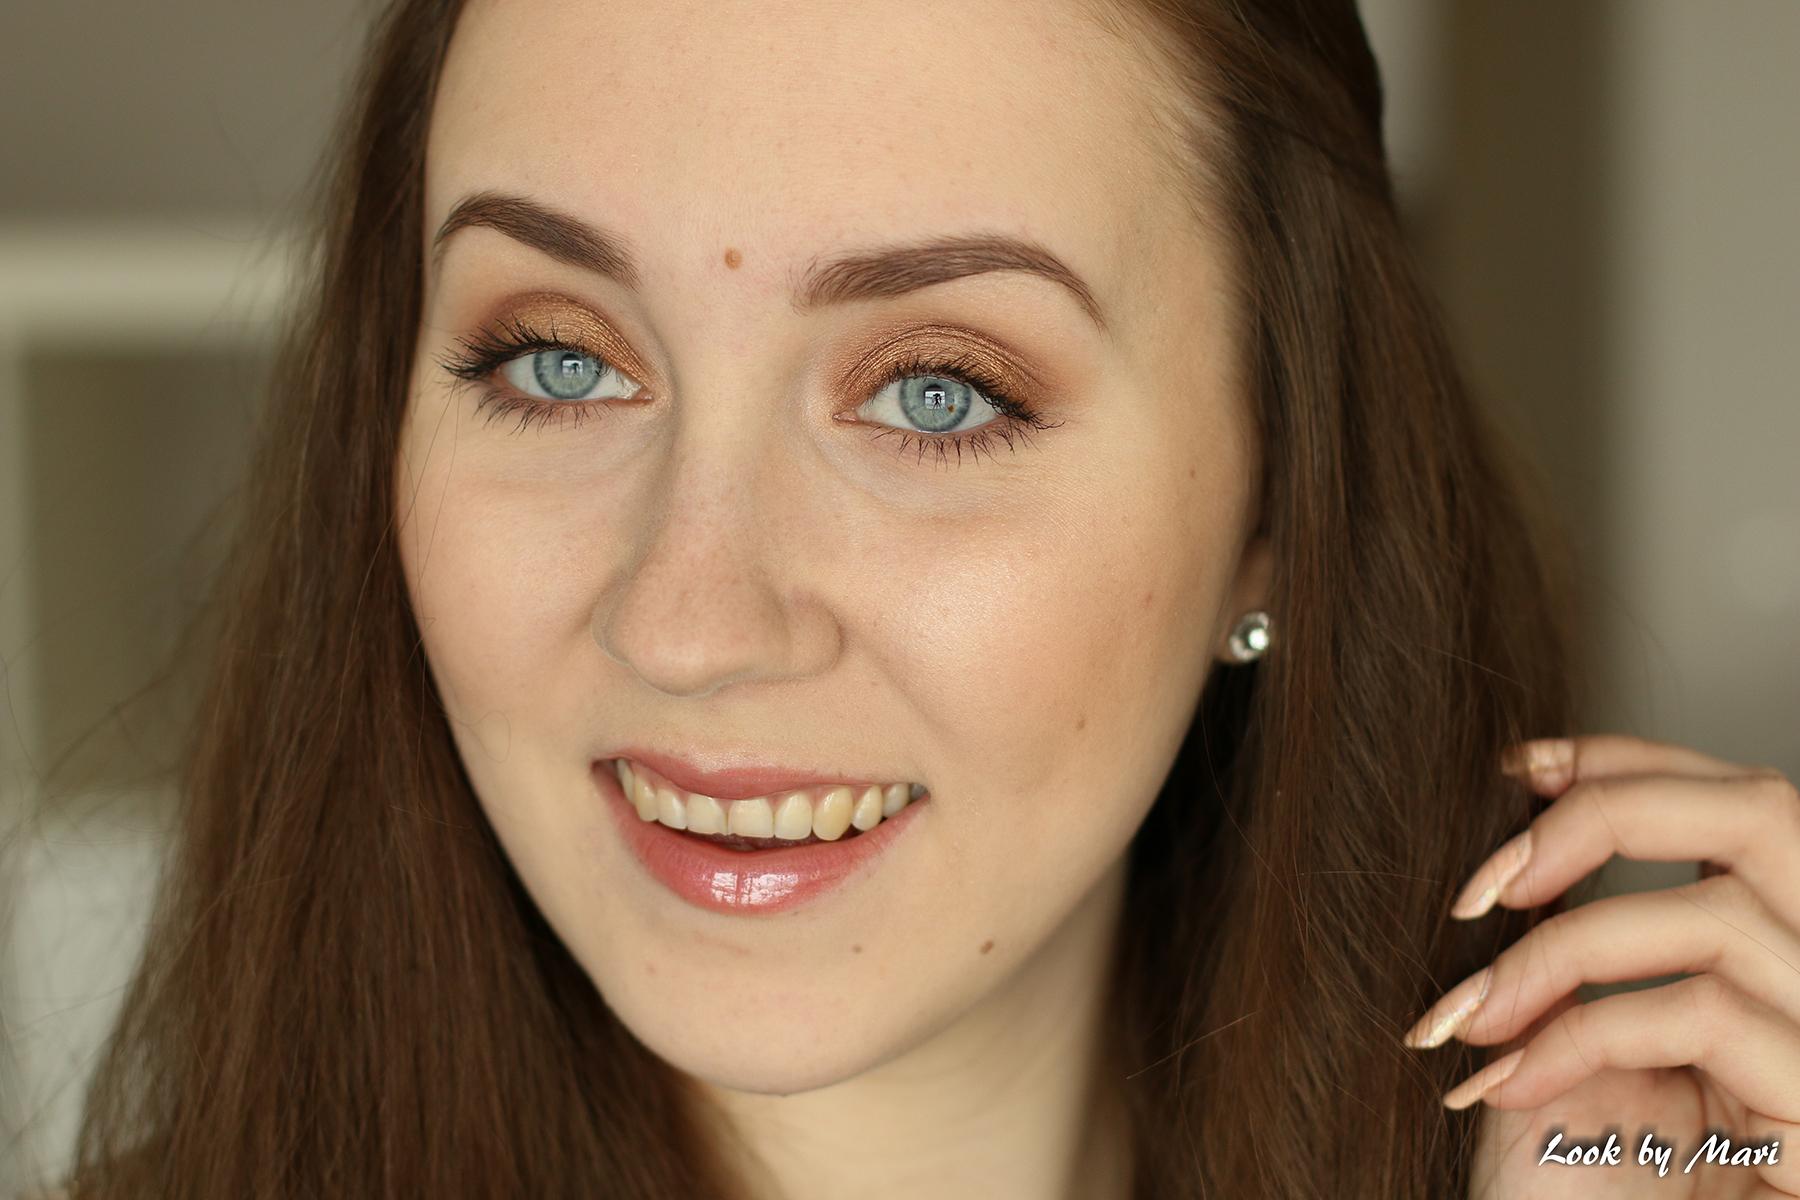 14 bh cosmetics x carli bybel palette silmämeikki ideat inspiraatio blogi